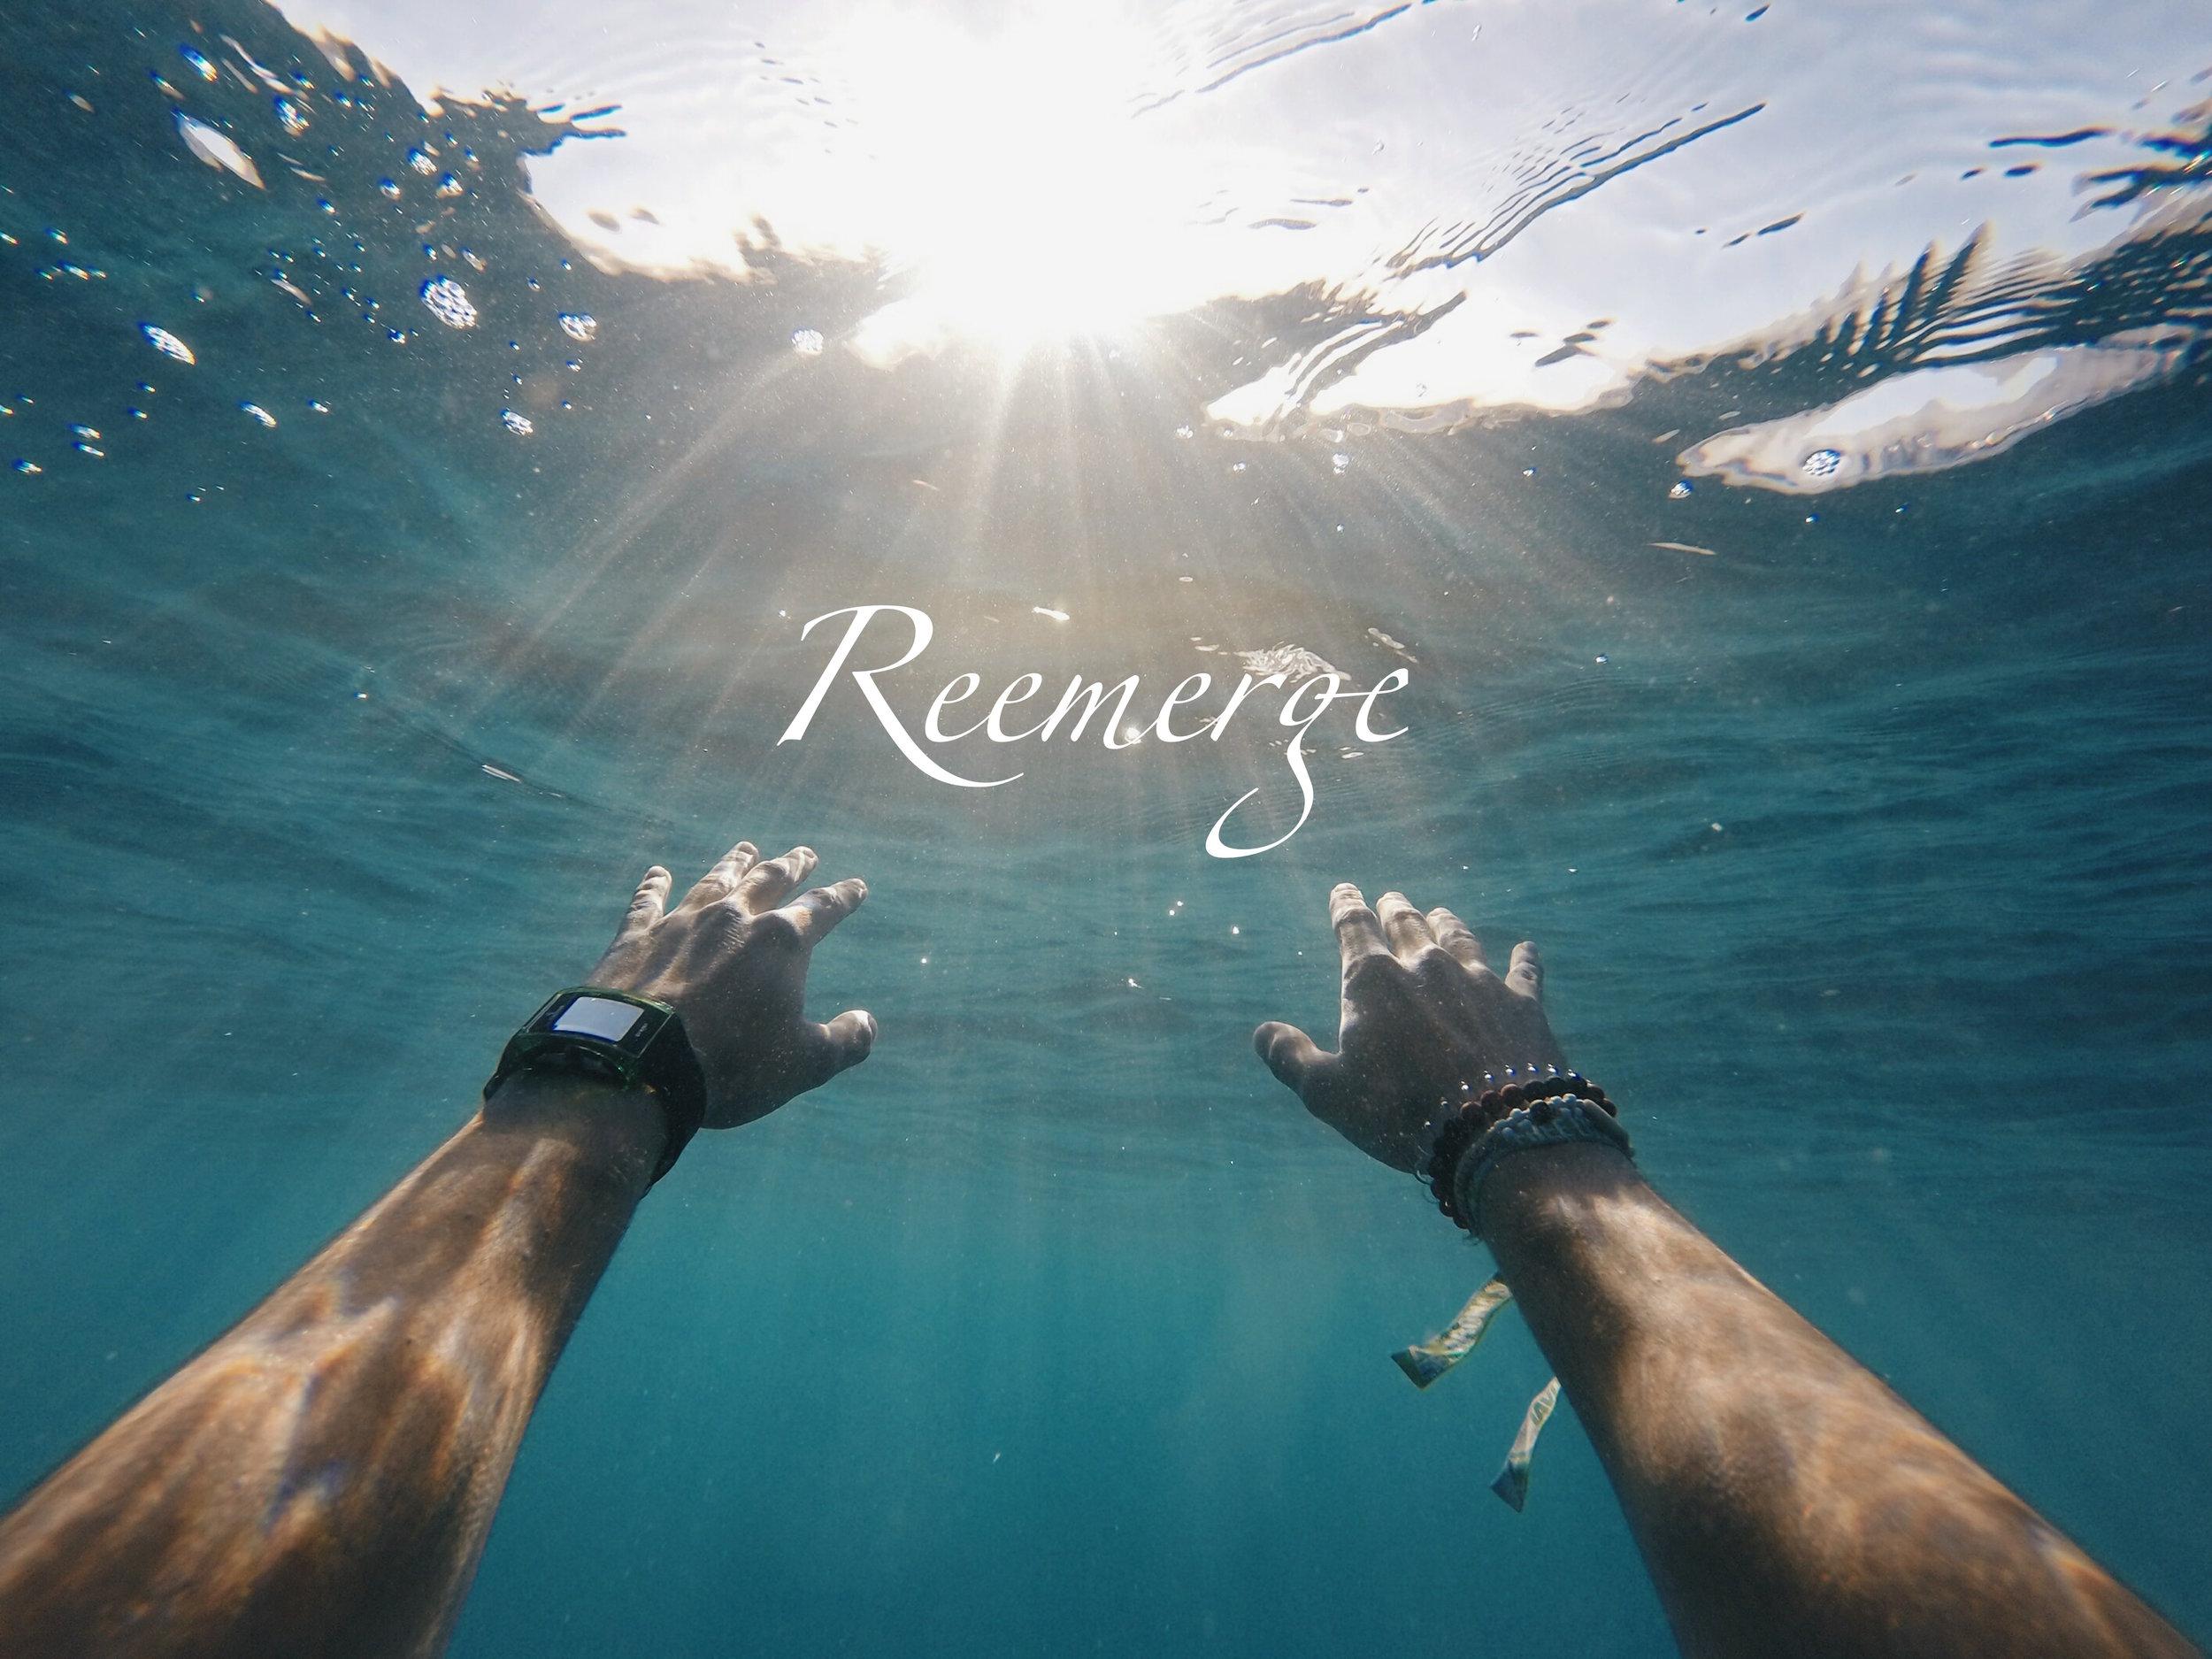 Reemerge Water.jpg